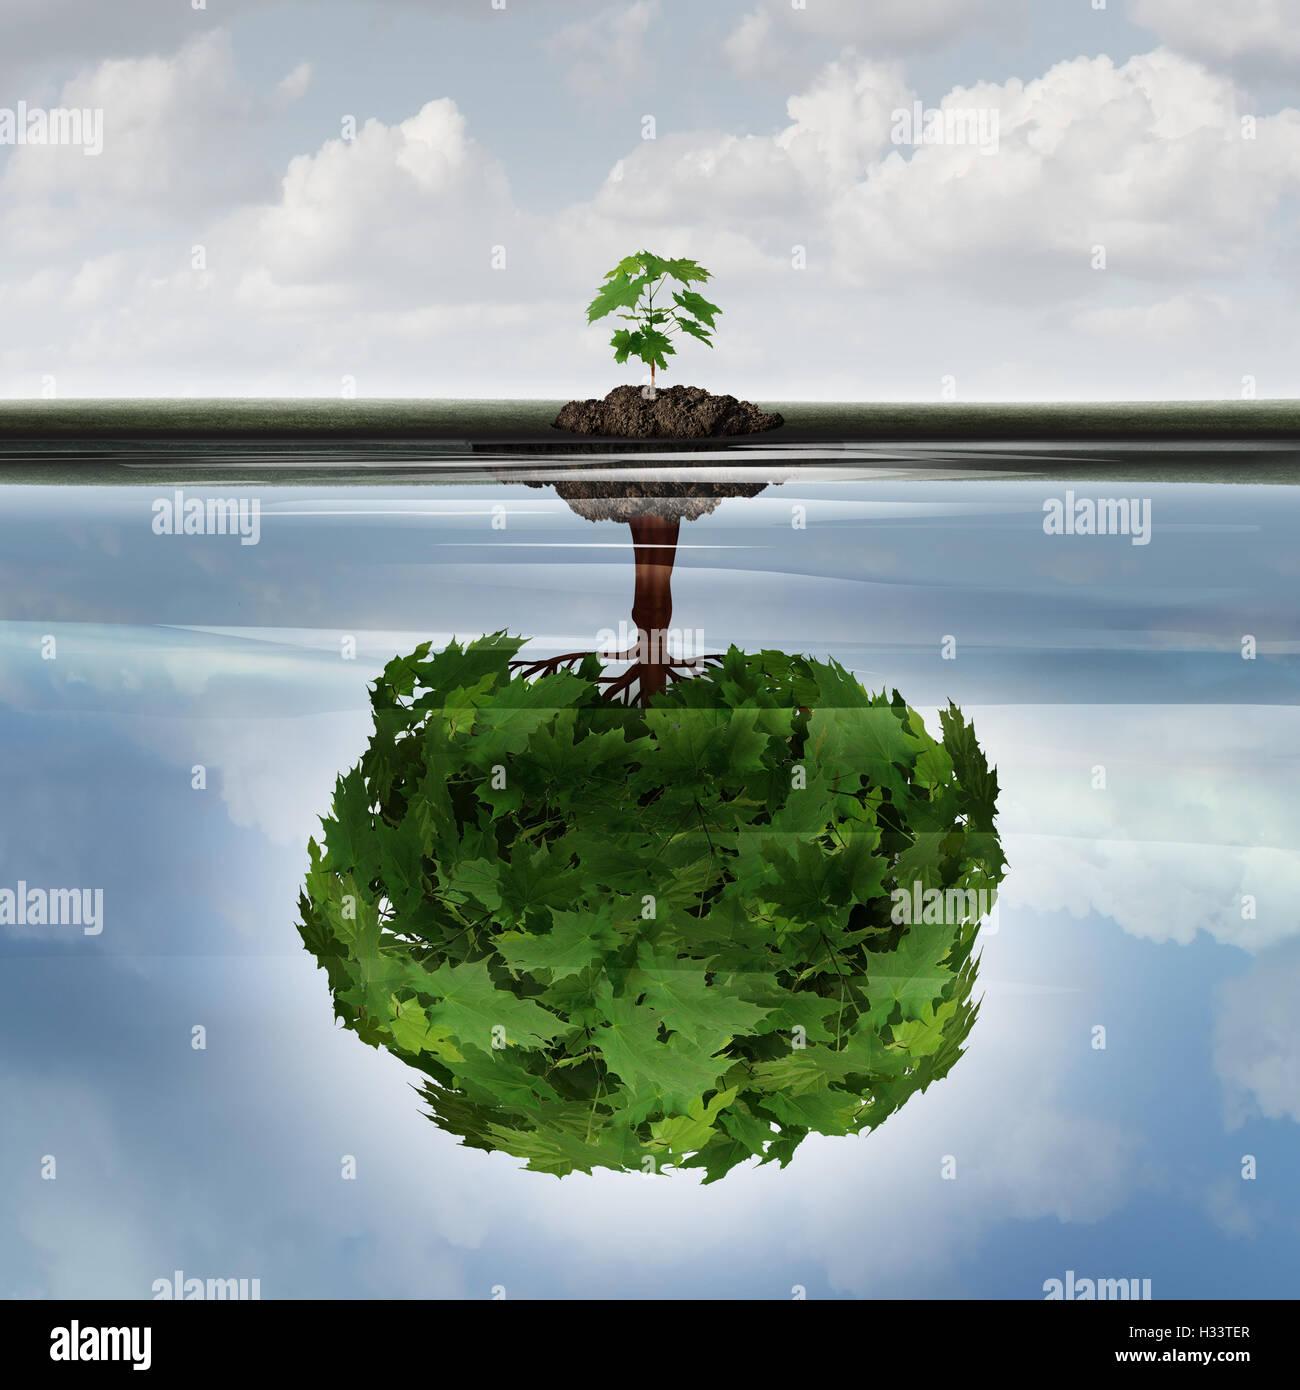 Potential Success Concept As A Symbol For Aspiration Philosophy Idea